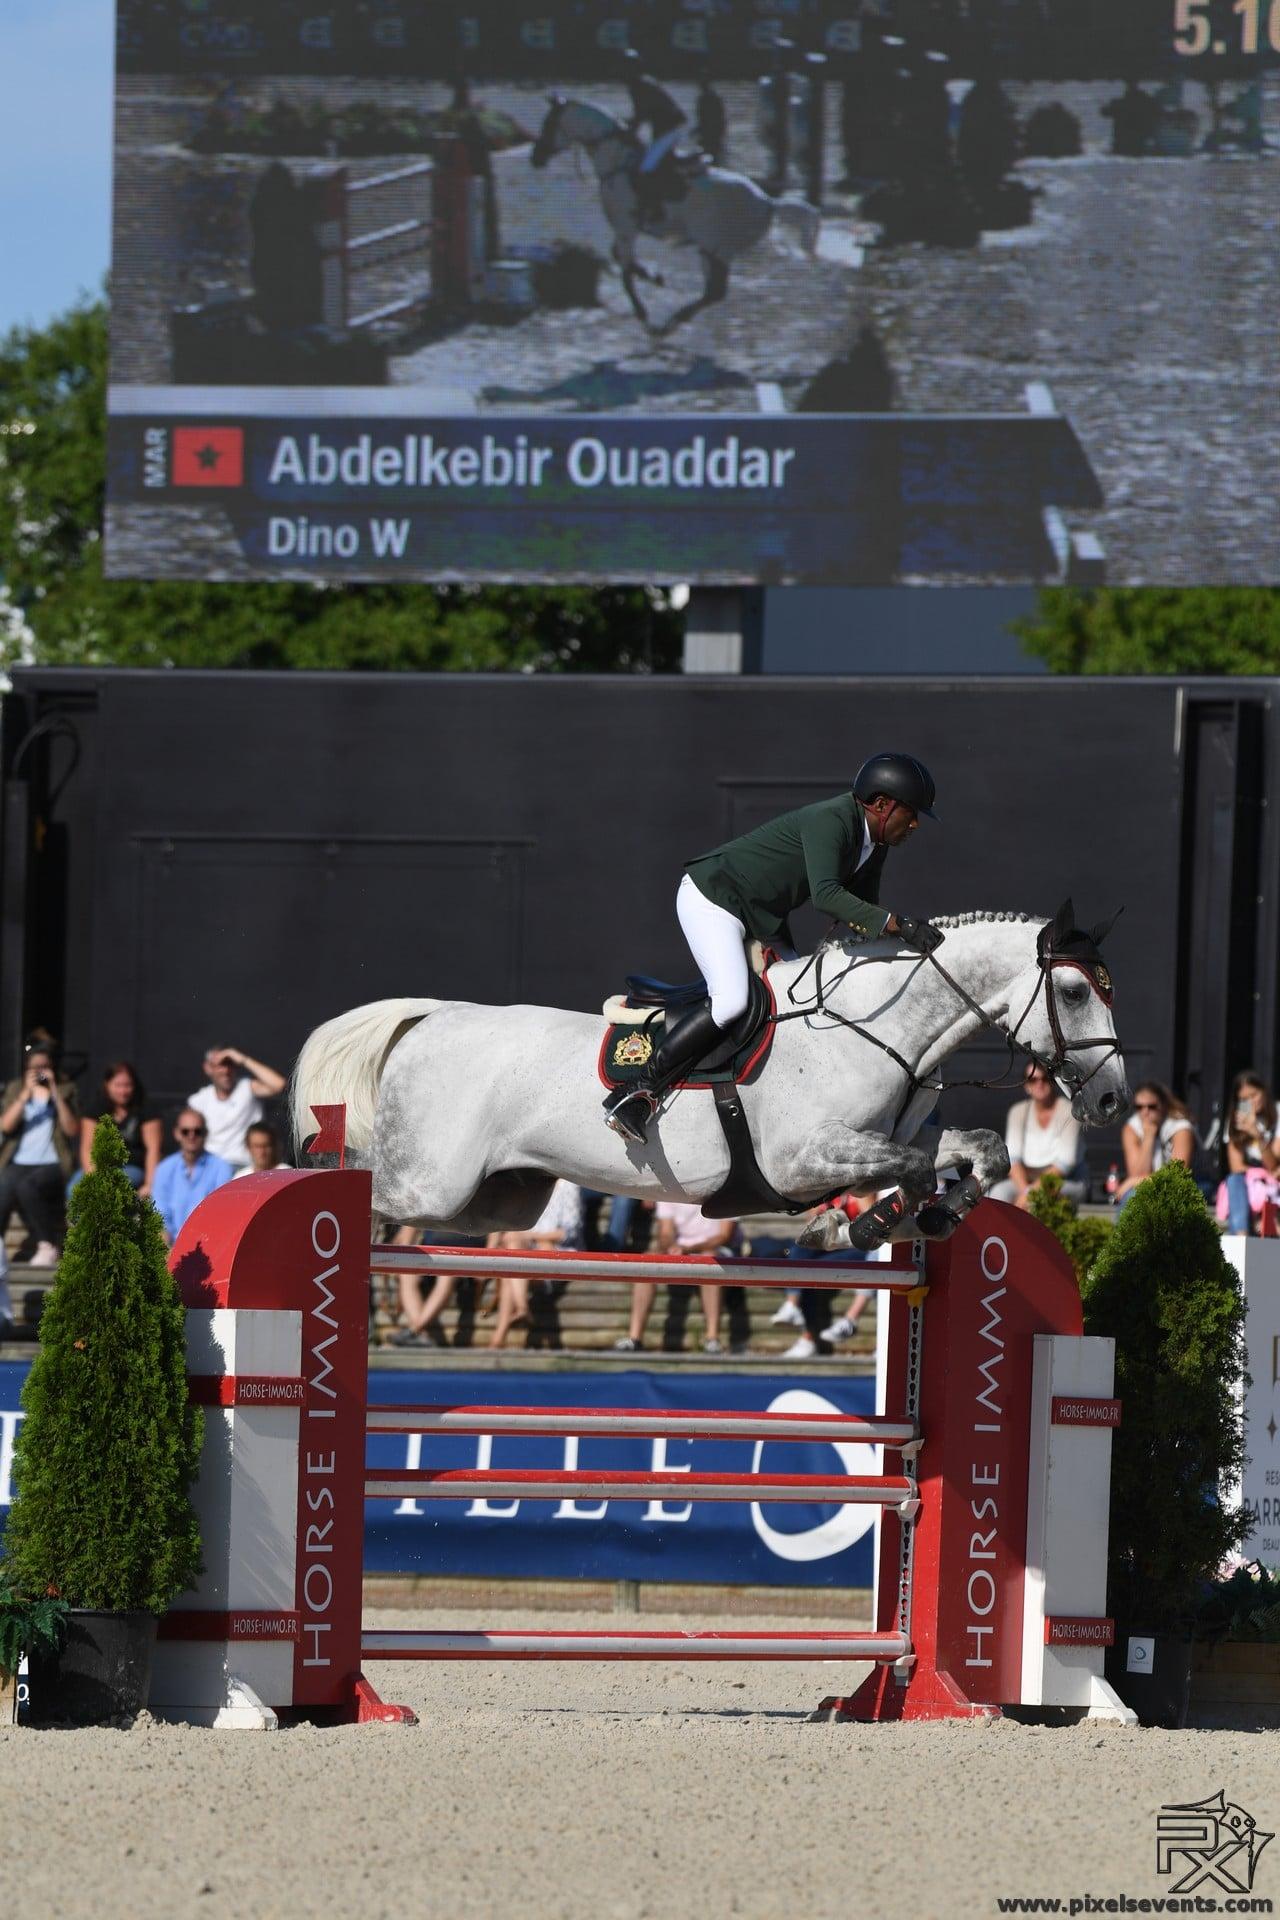 Le marocain Abdelkebir Ouaddar